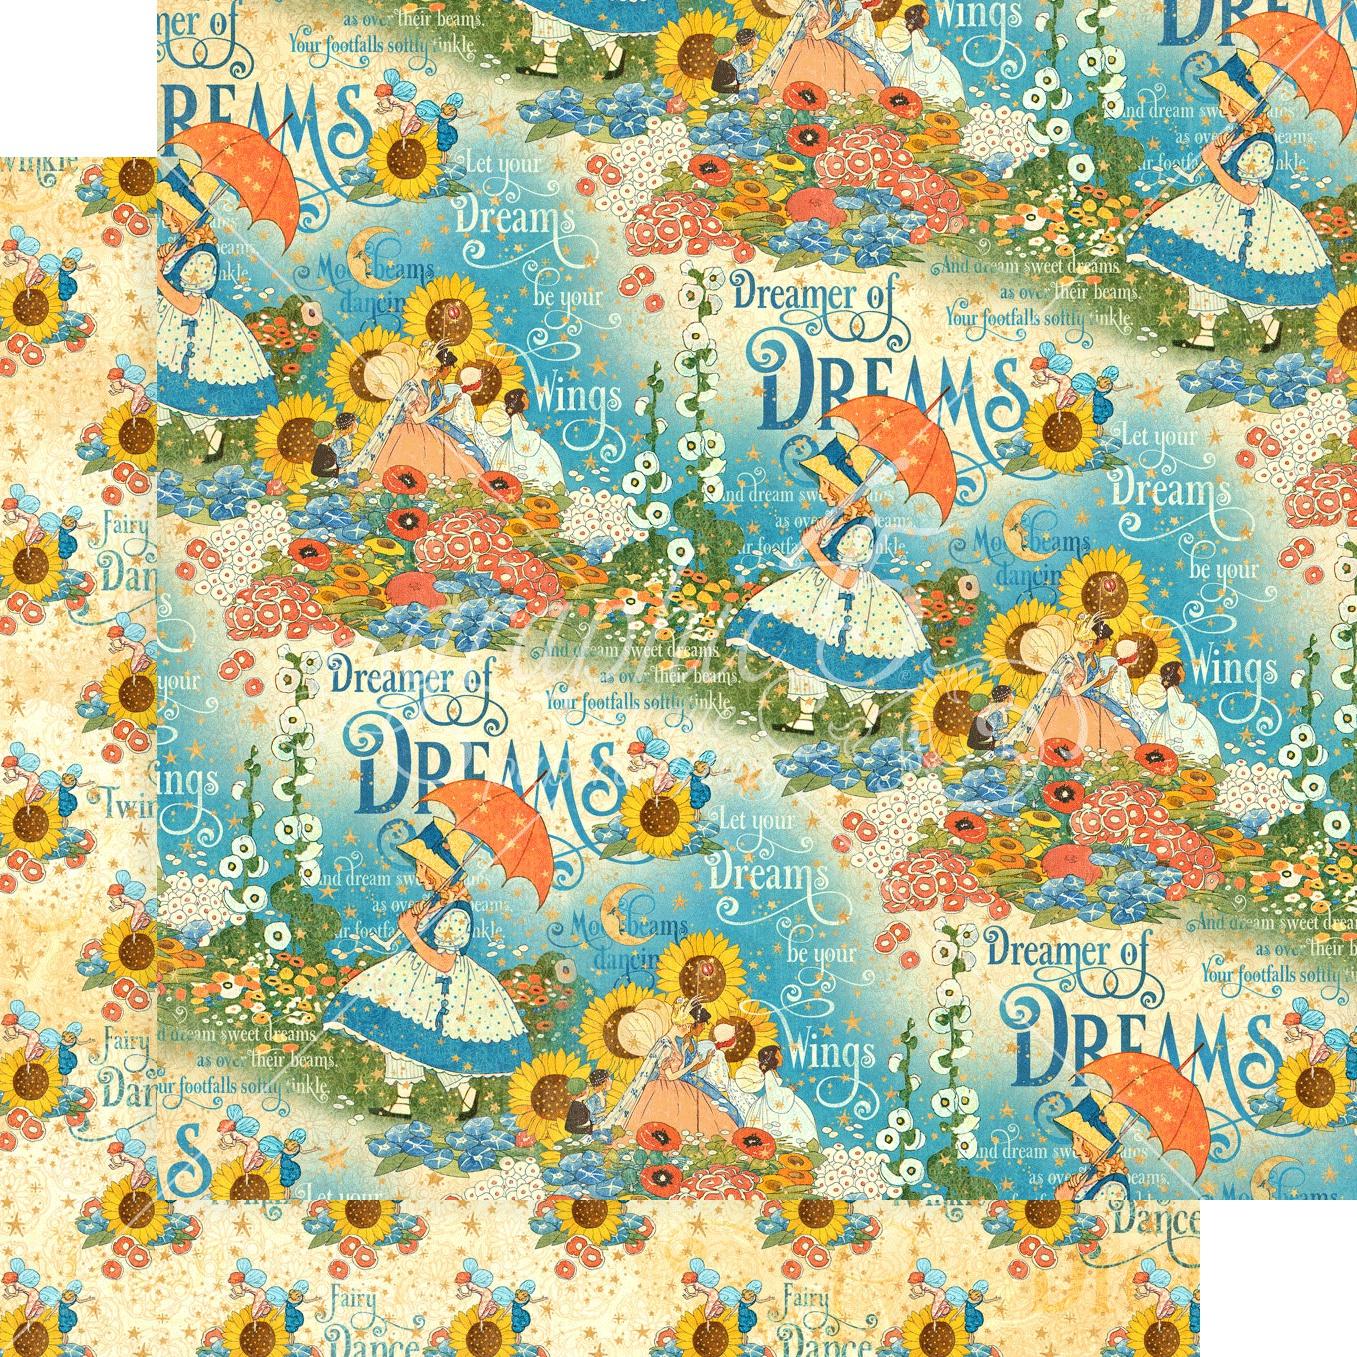 Dreamland-Enchanted Garden 12x12 paper